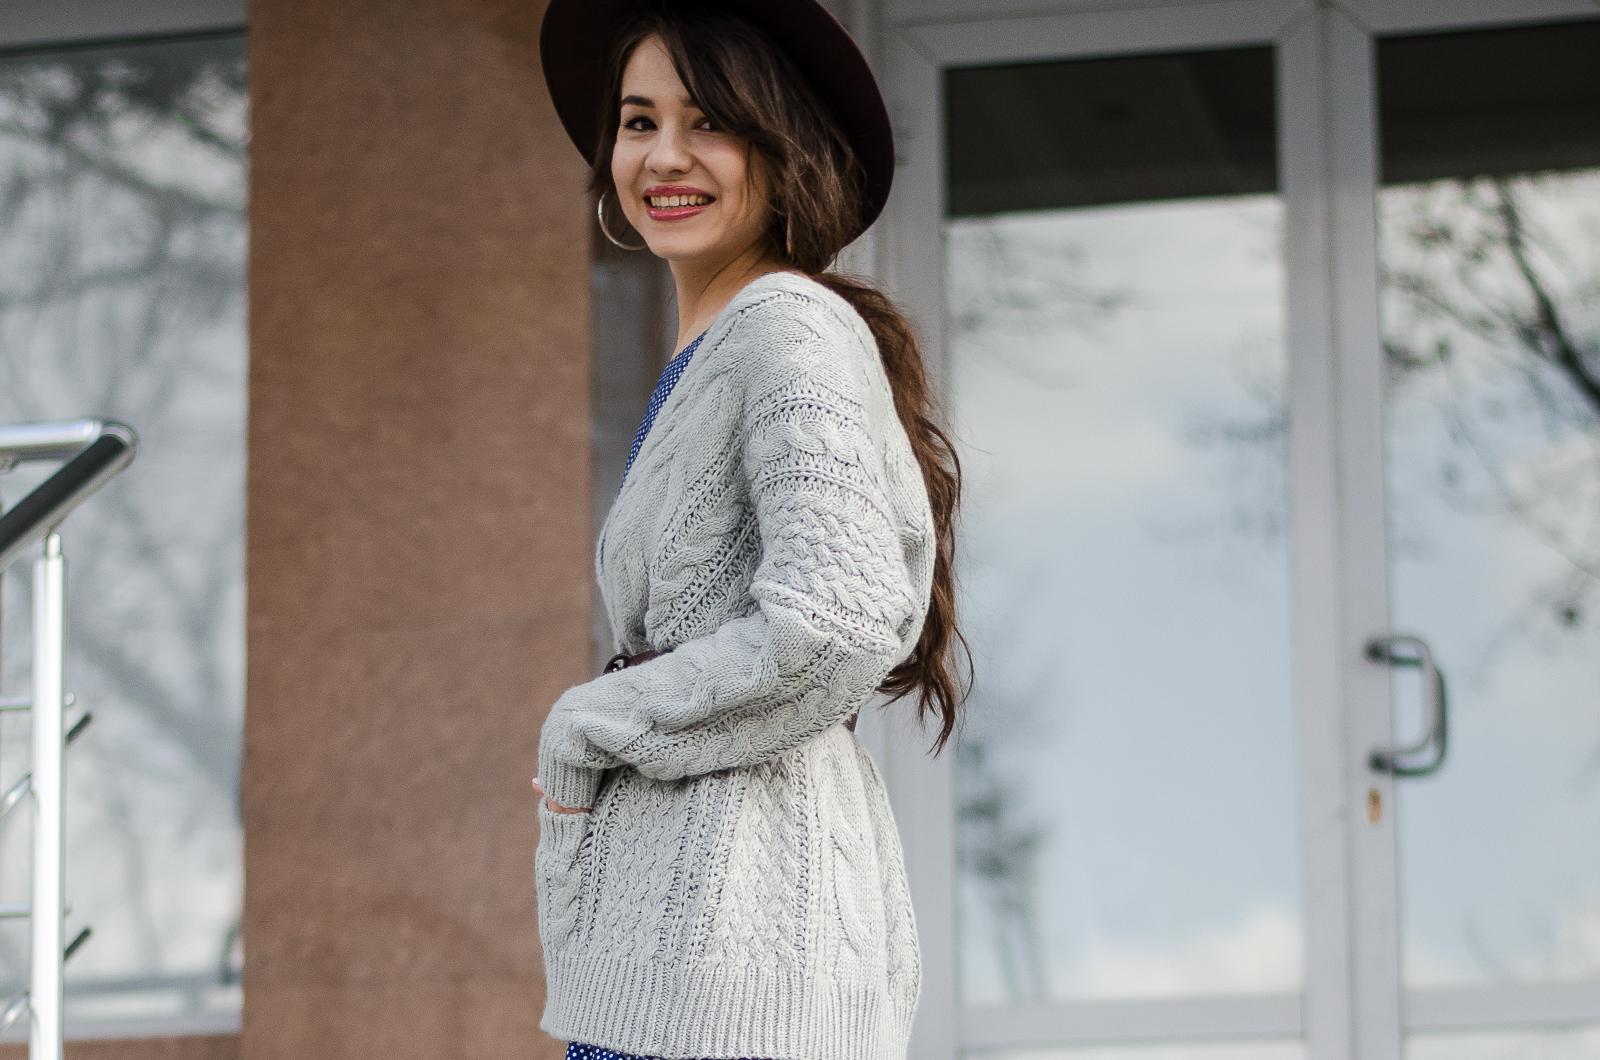 fashion blogger diyorasnotes diyora beta polka dot dress knitted cardigan